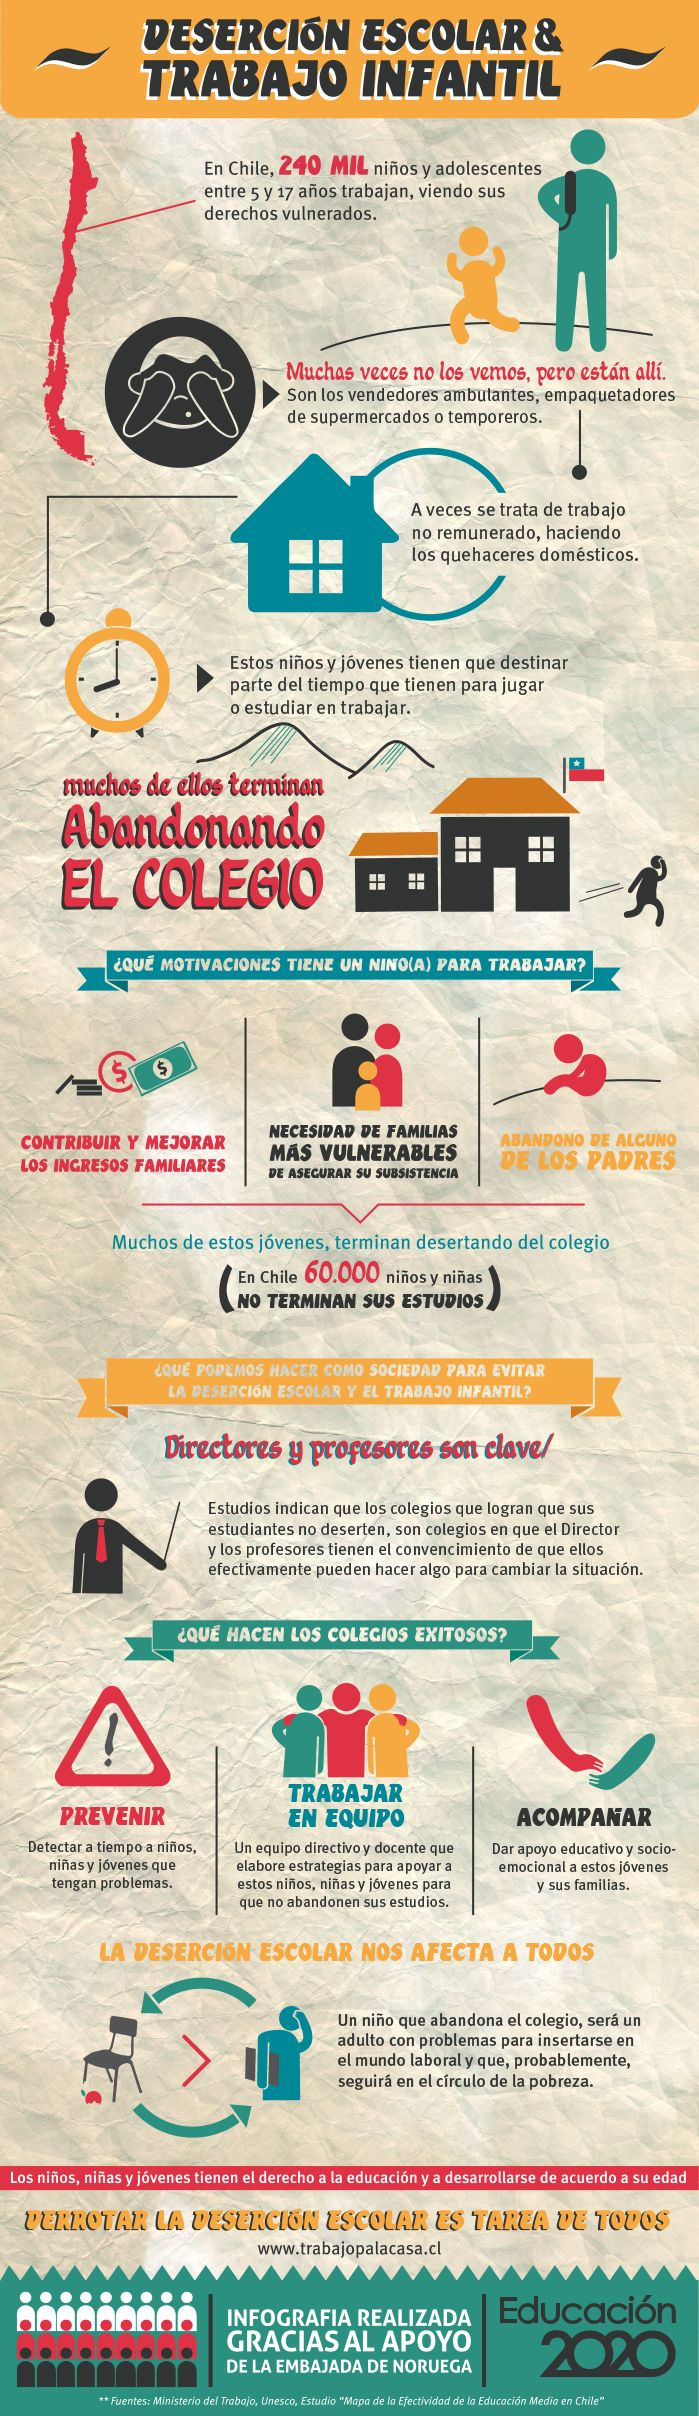 Deserción escolar en Chile.